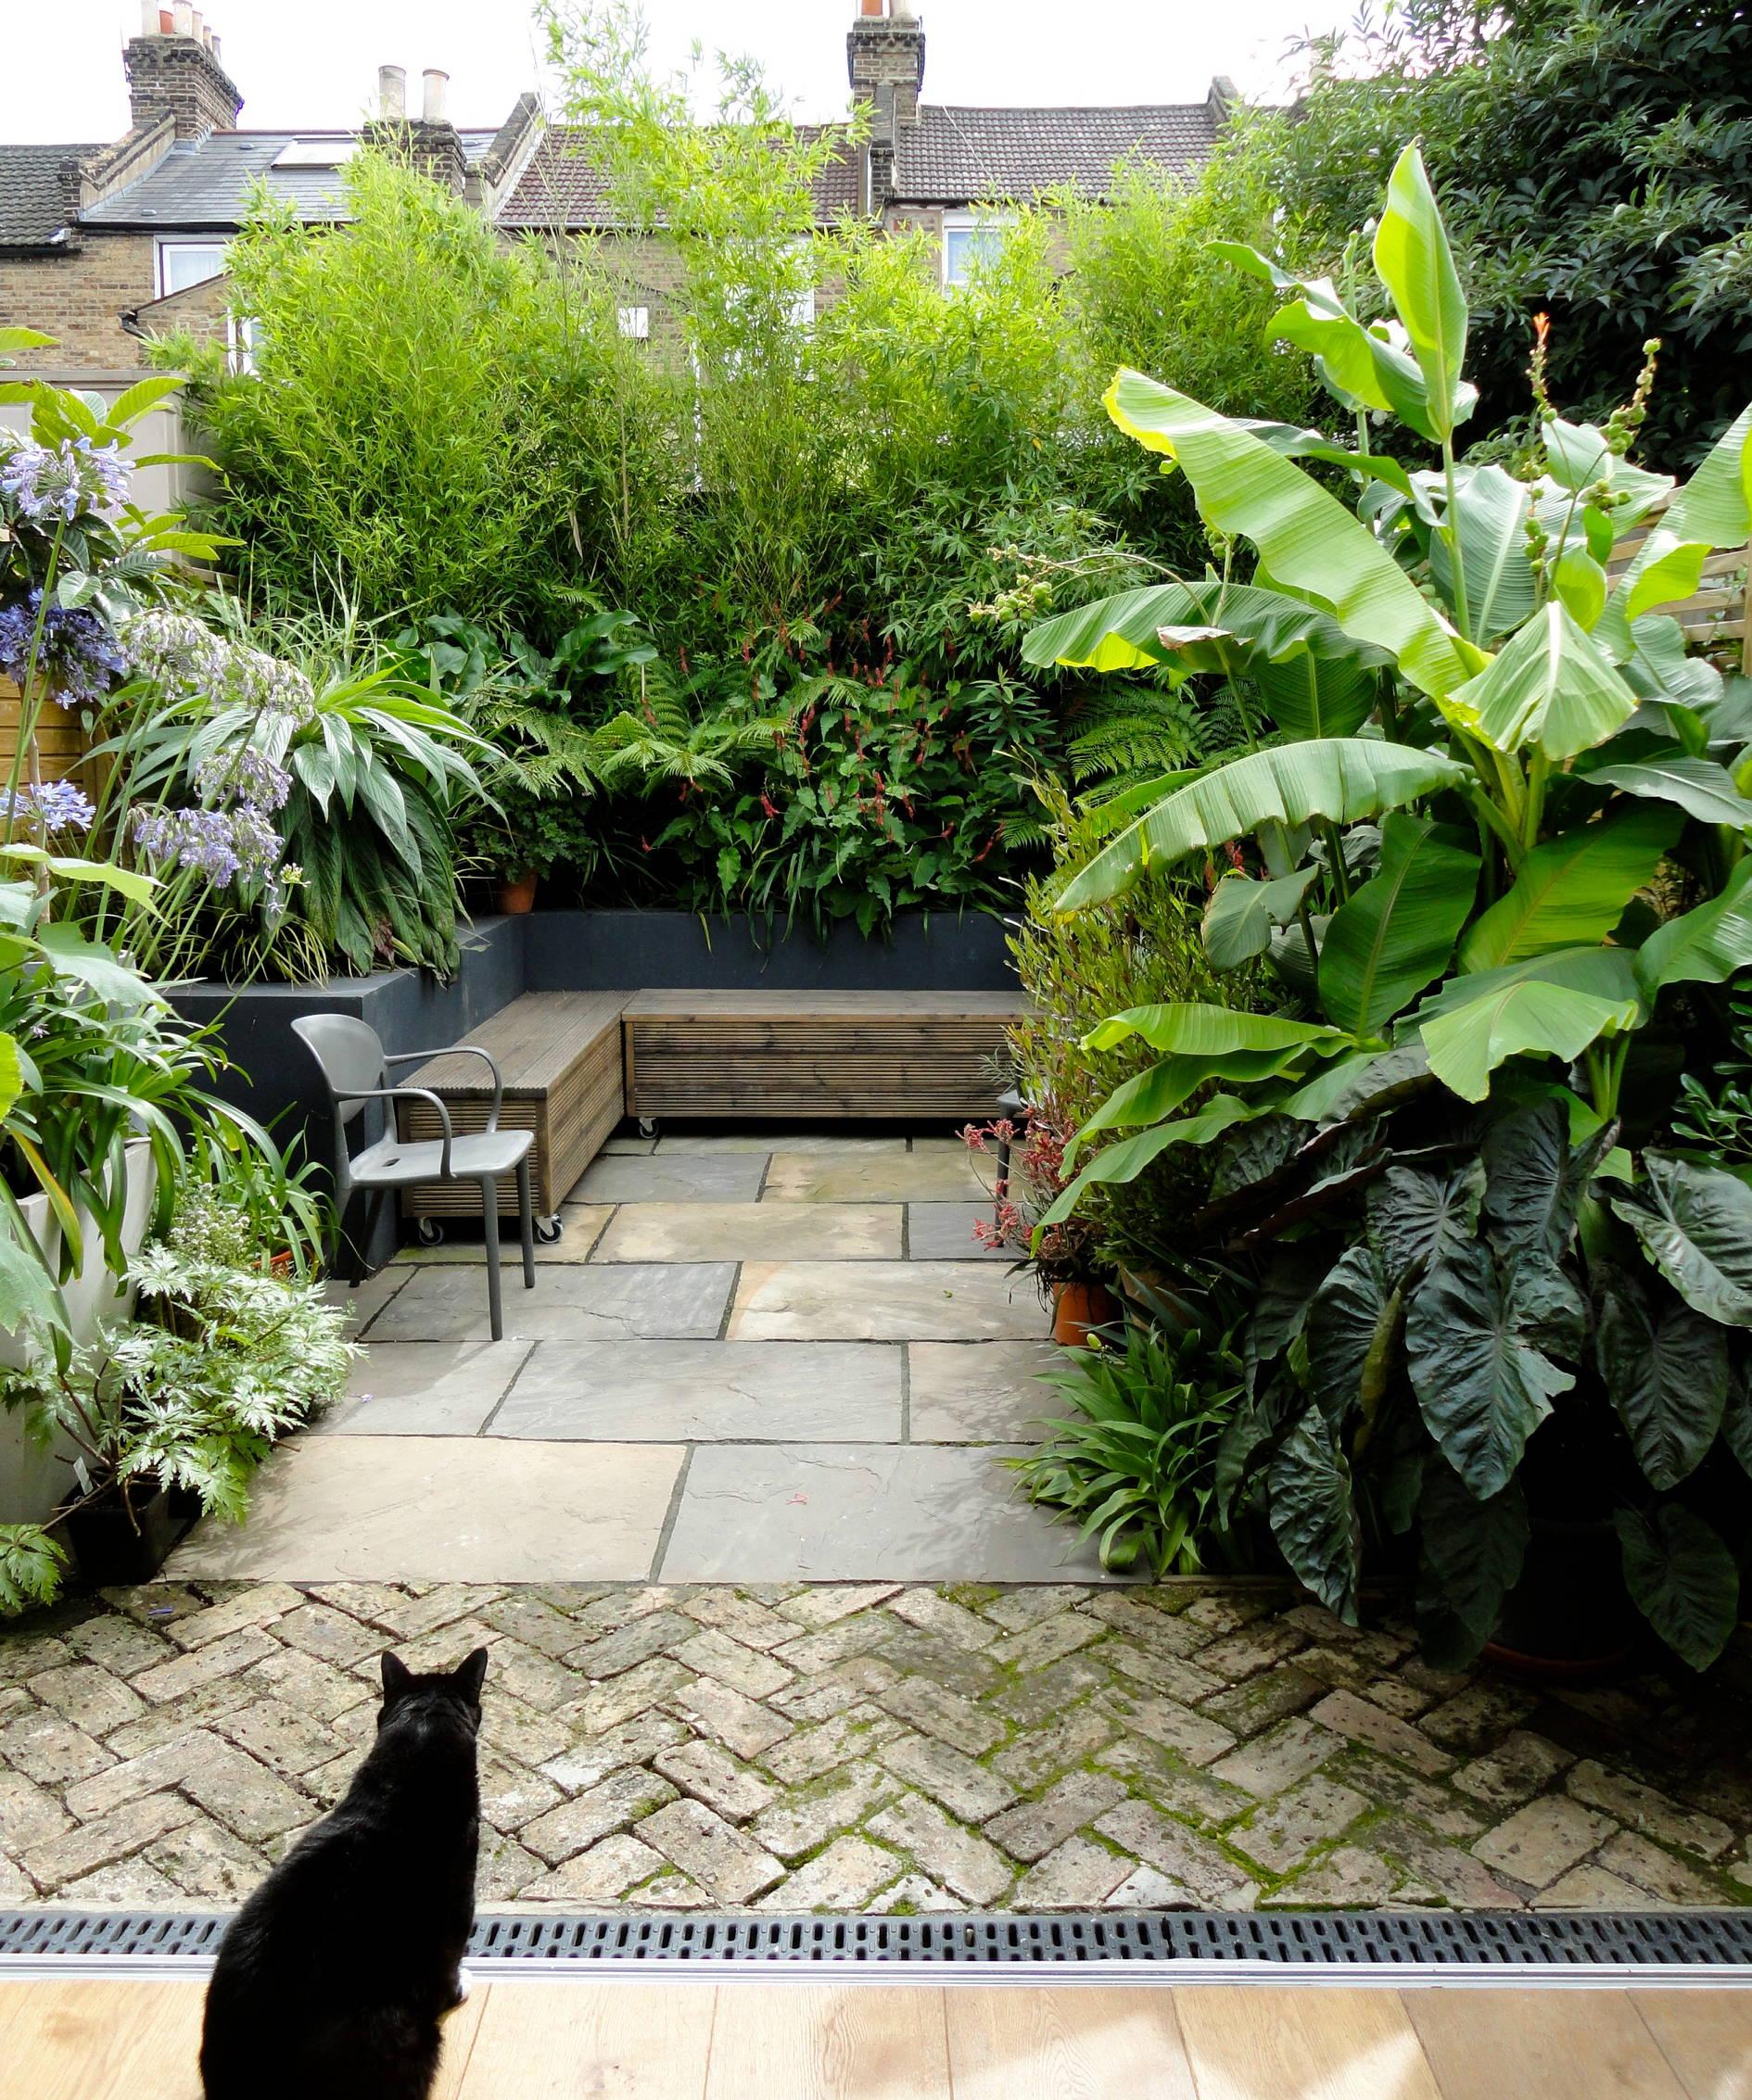 Tropical Garden Ideas to Inspire Your Outdoor Plans   Houzz UK